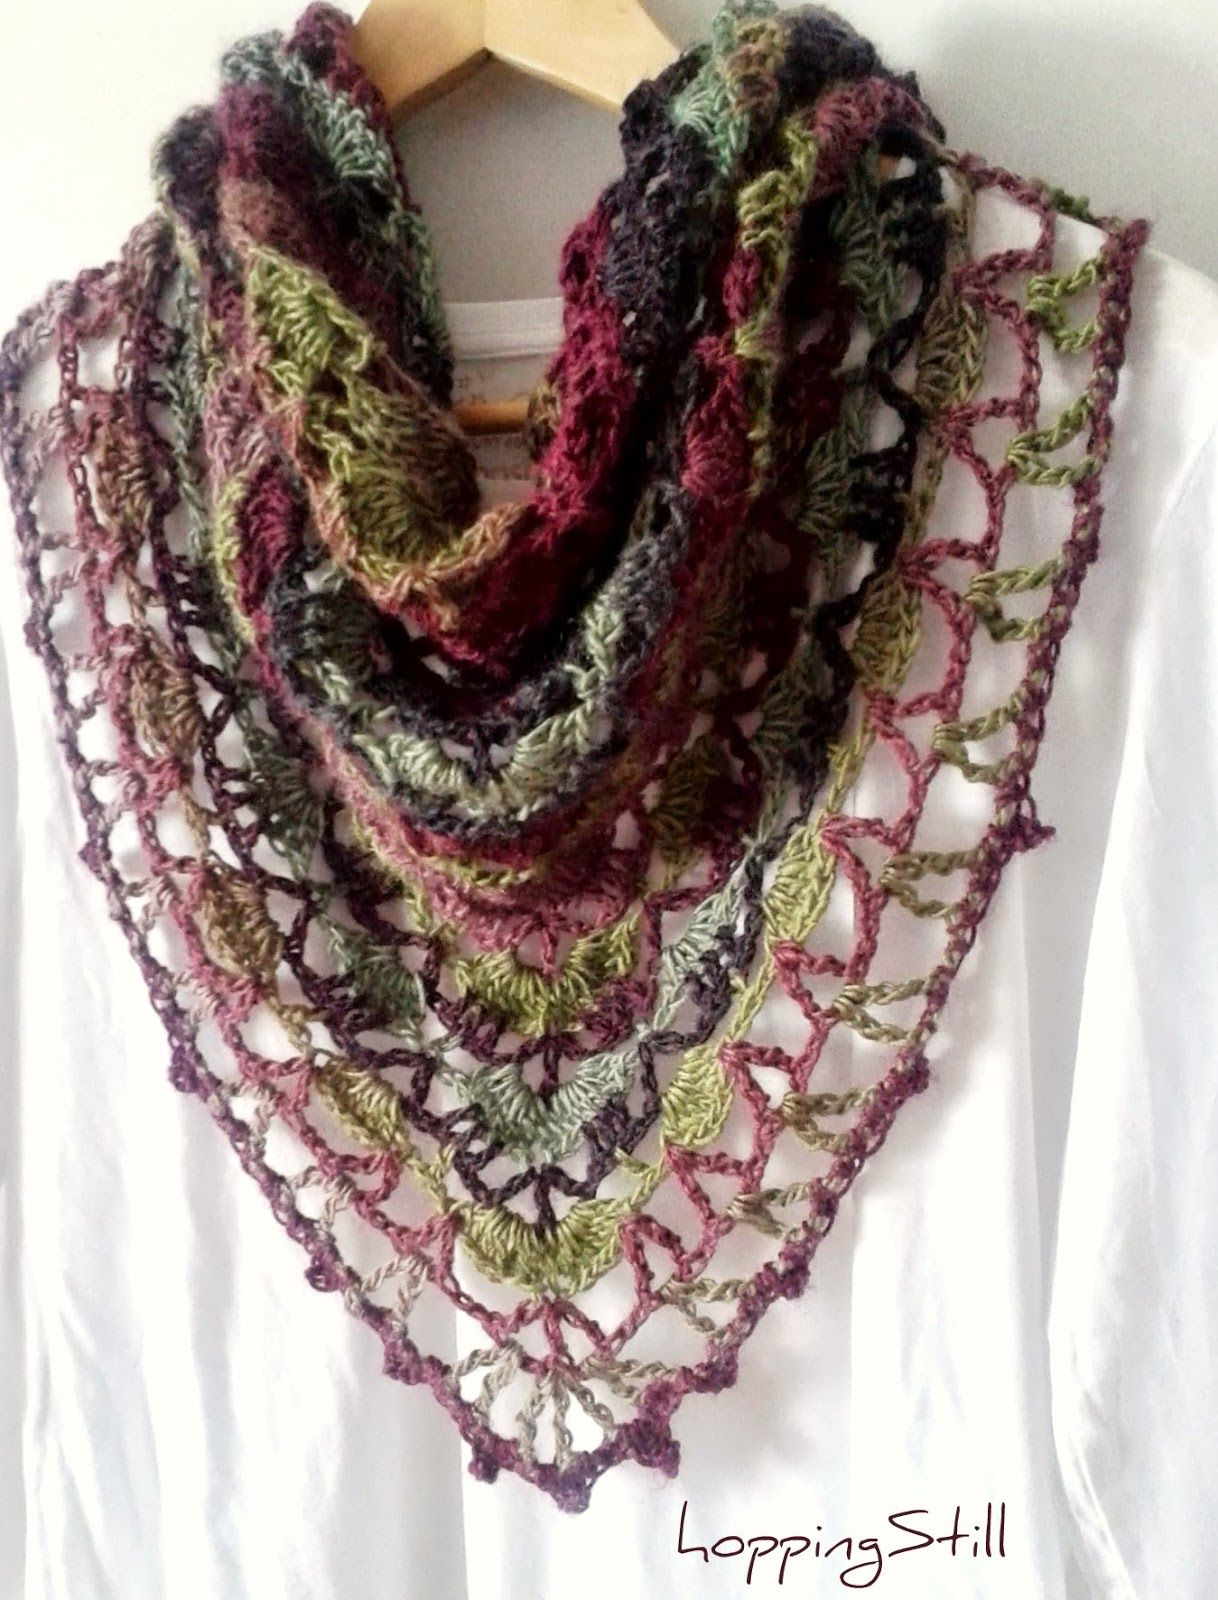 Pin de Misty Boone {The BarnPrincess} en Crochet for Me | Pinterest ...